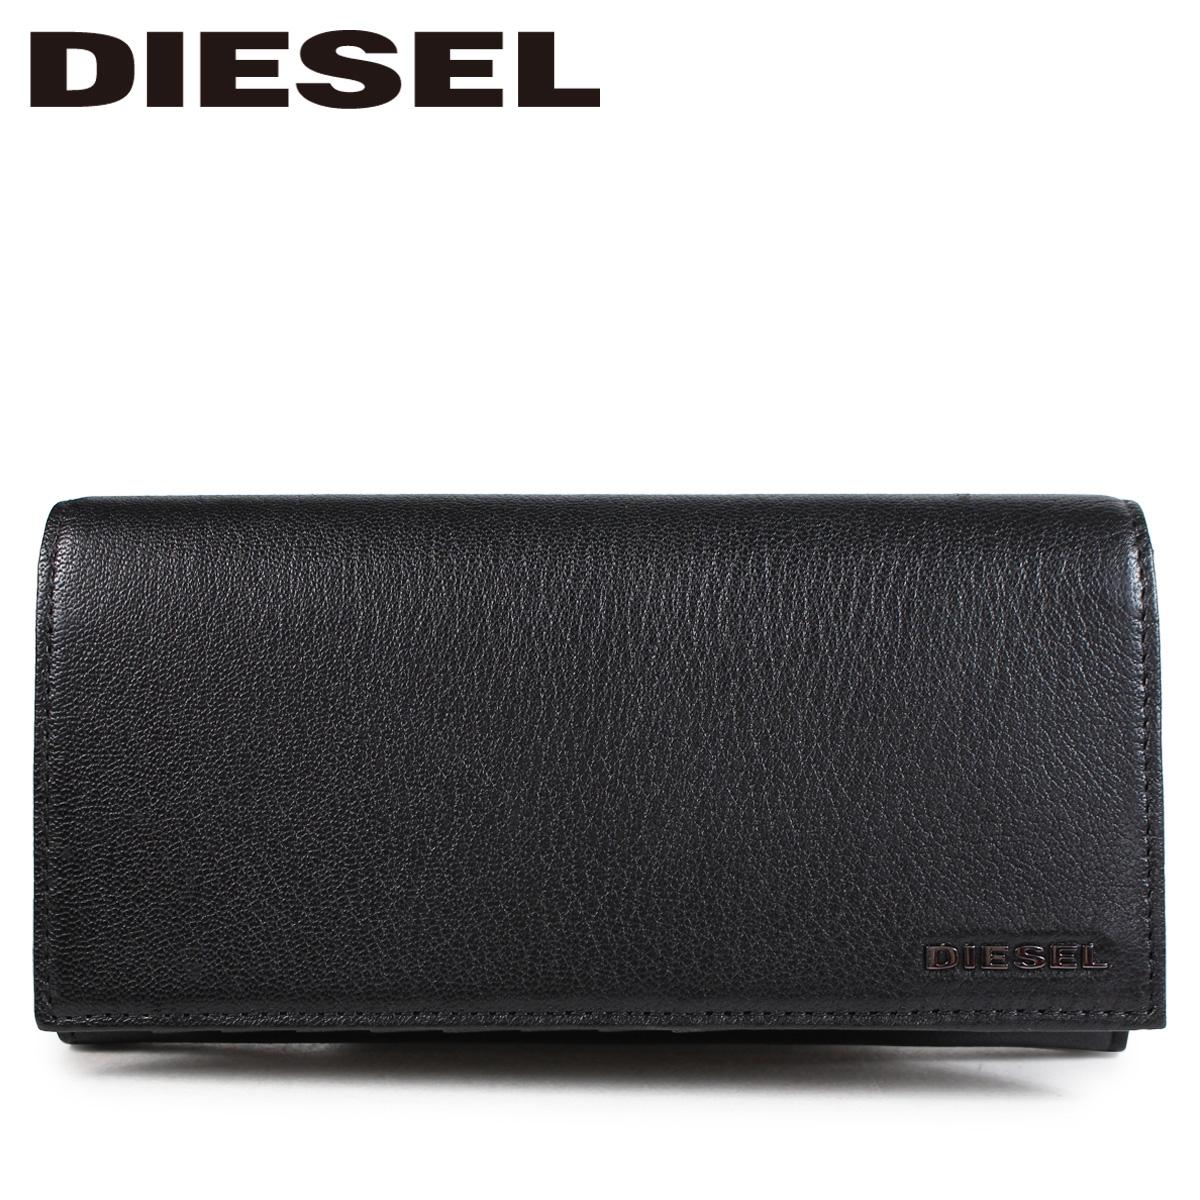 DIESEL ディーゼル 財布 長財布 メンズ 二つ折り ARIANO 24 A DAY ブラック X05984 P0396